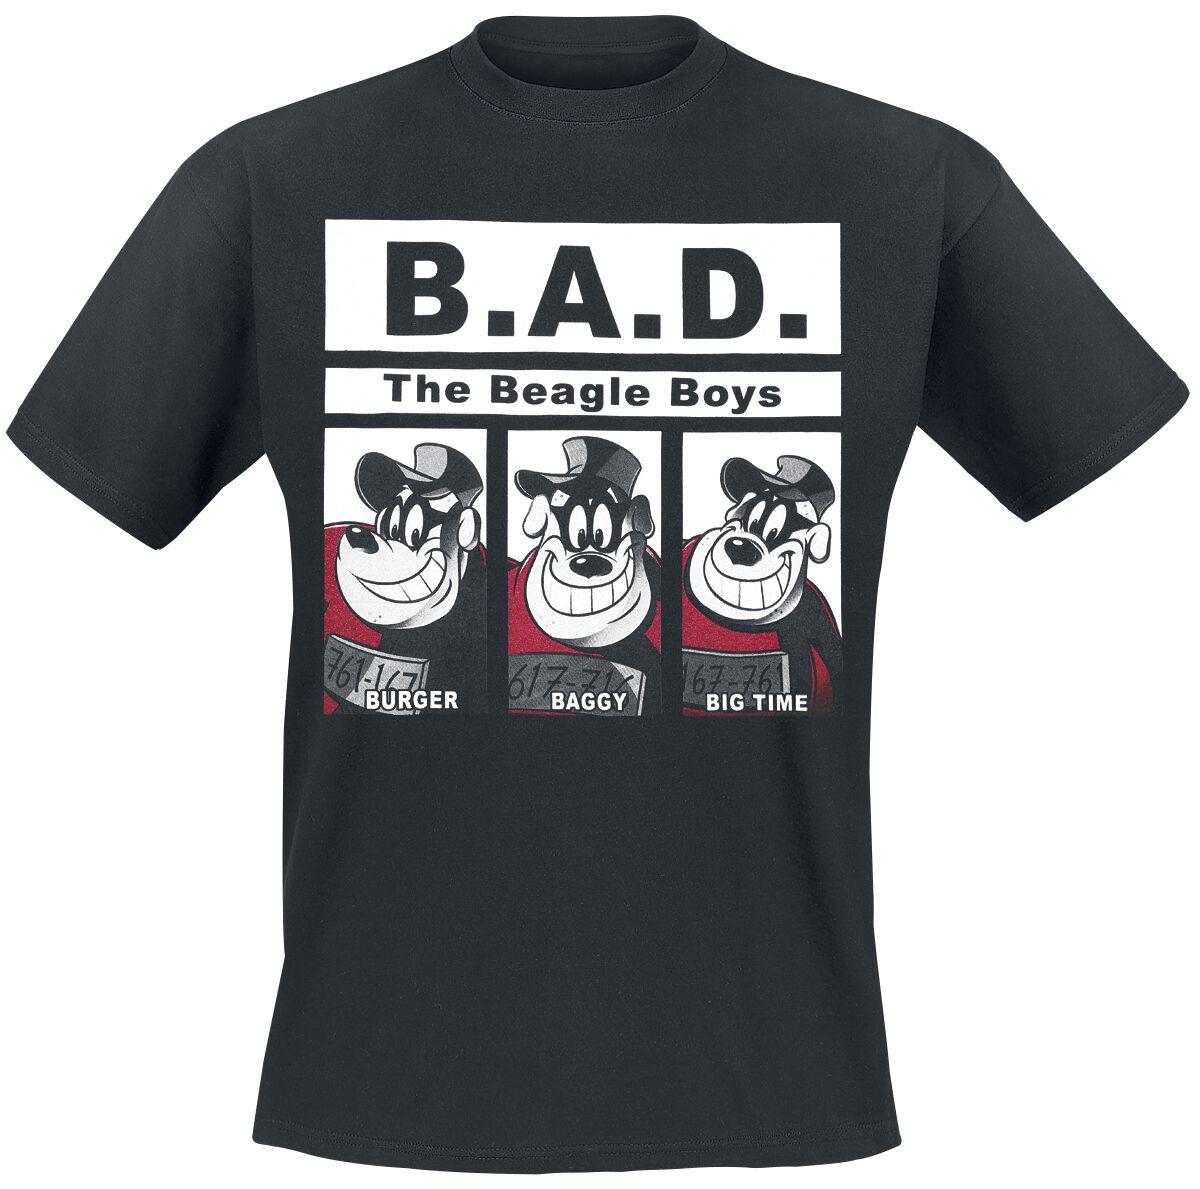 Cheap Disney T Shirts Uk Carrerasconfuturo Com